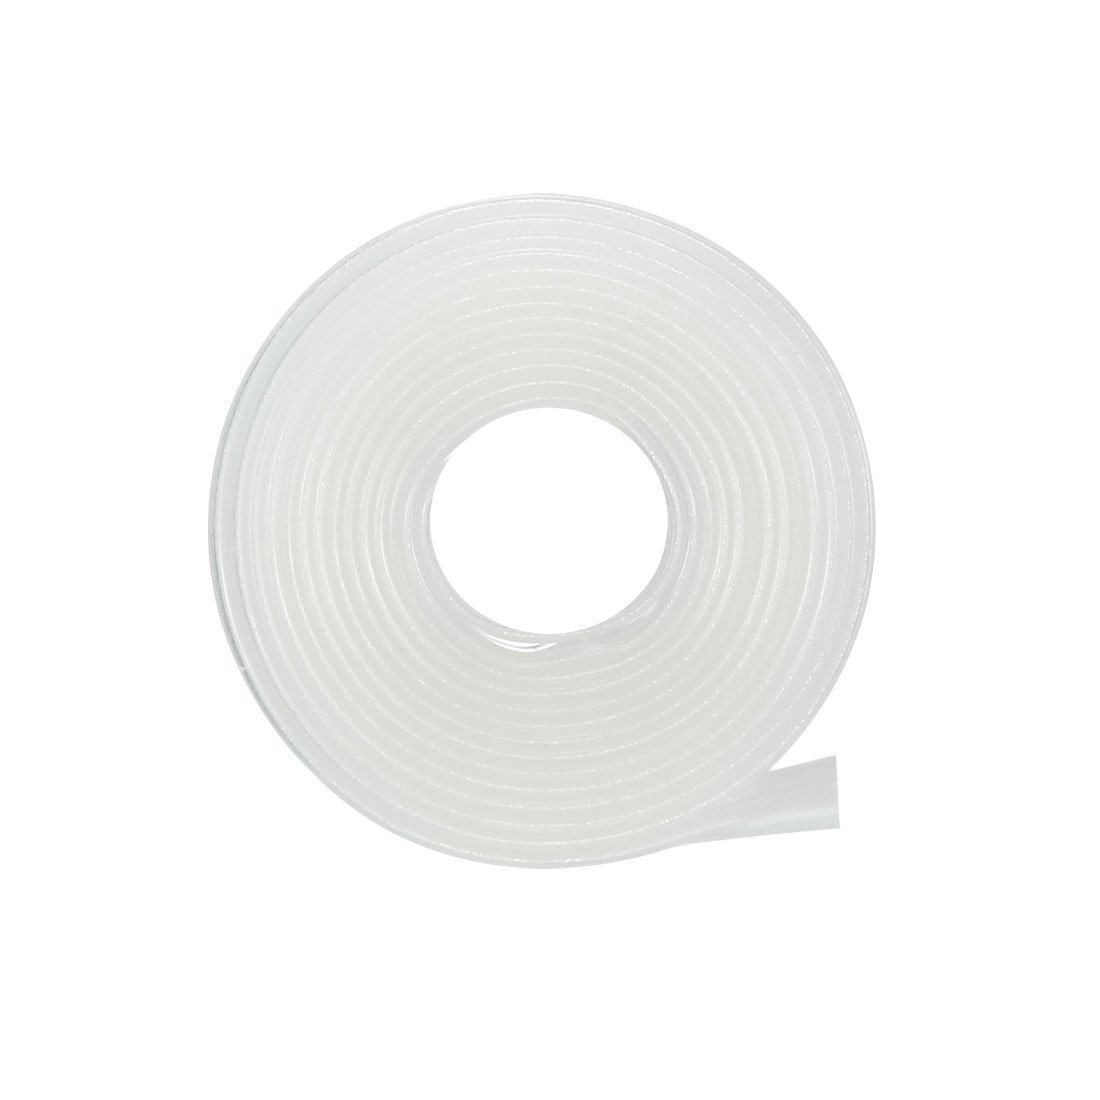 uxcell Cheap sale Heat Shrink Tubing 15mm Dia 2:1 Flat Width Overseas parallel import regular item S 25mm 1m